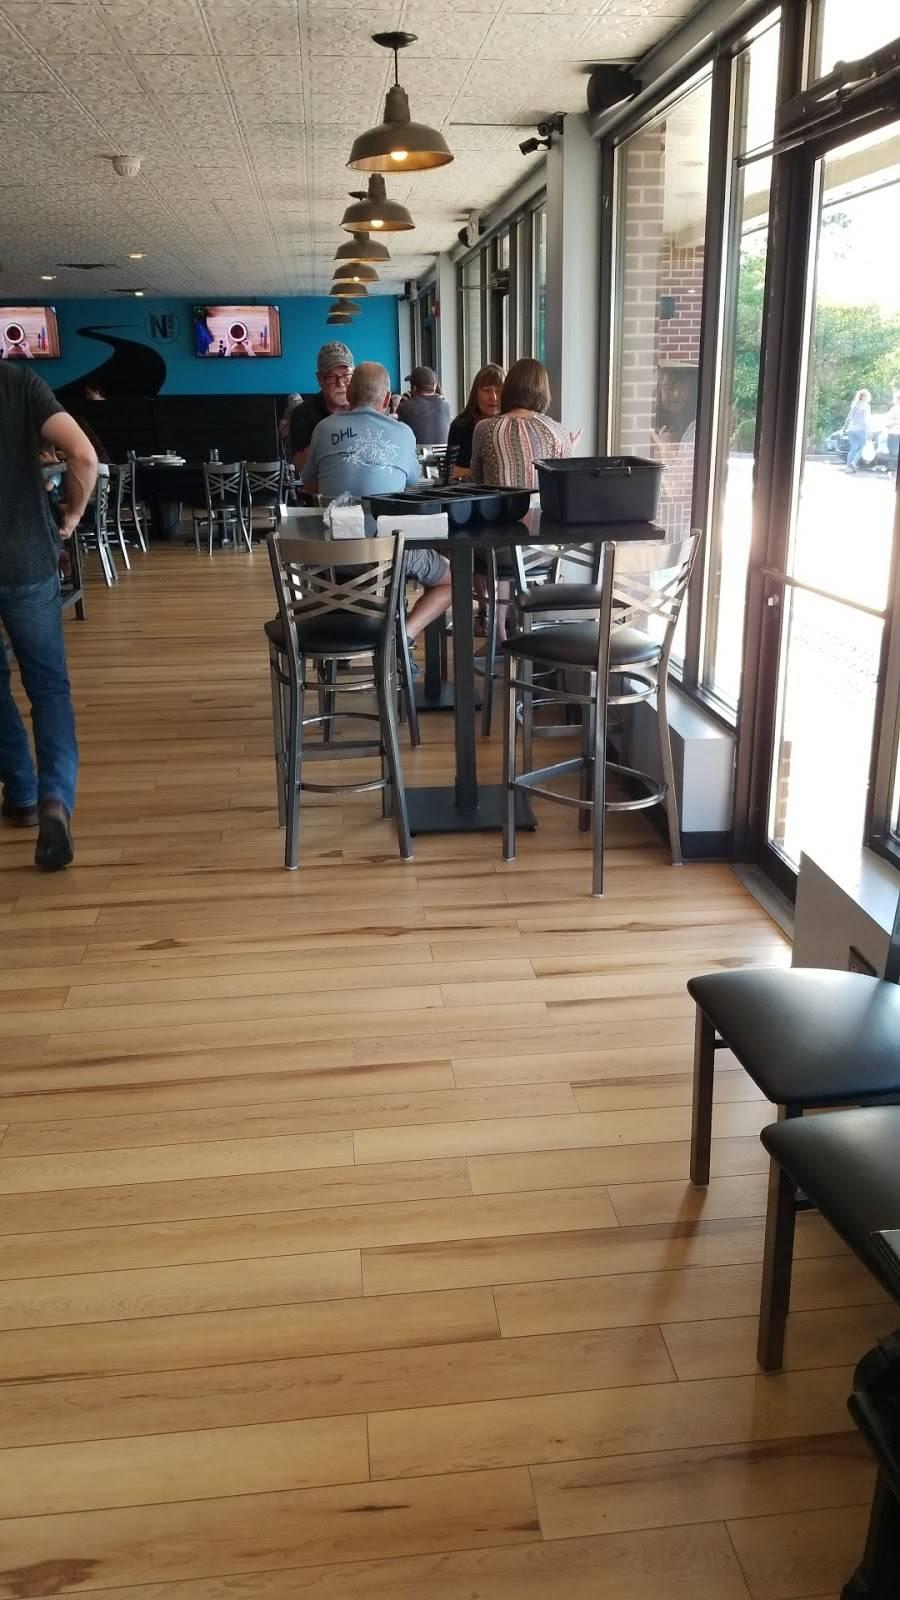 Nigh Brewpub | restaurant | 2067 Hadley Rd, Plainfield, IN 46168, USA